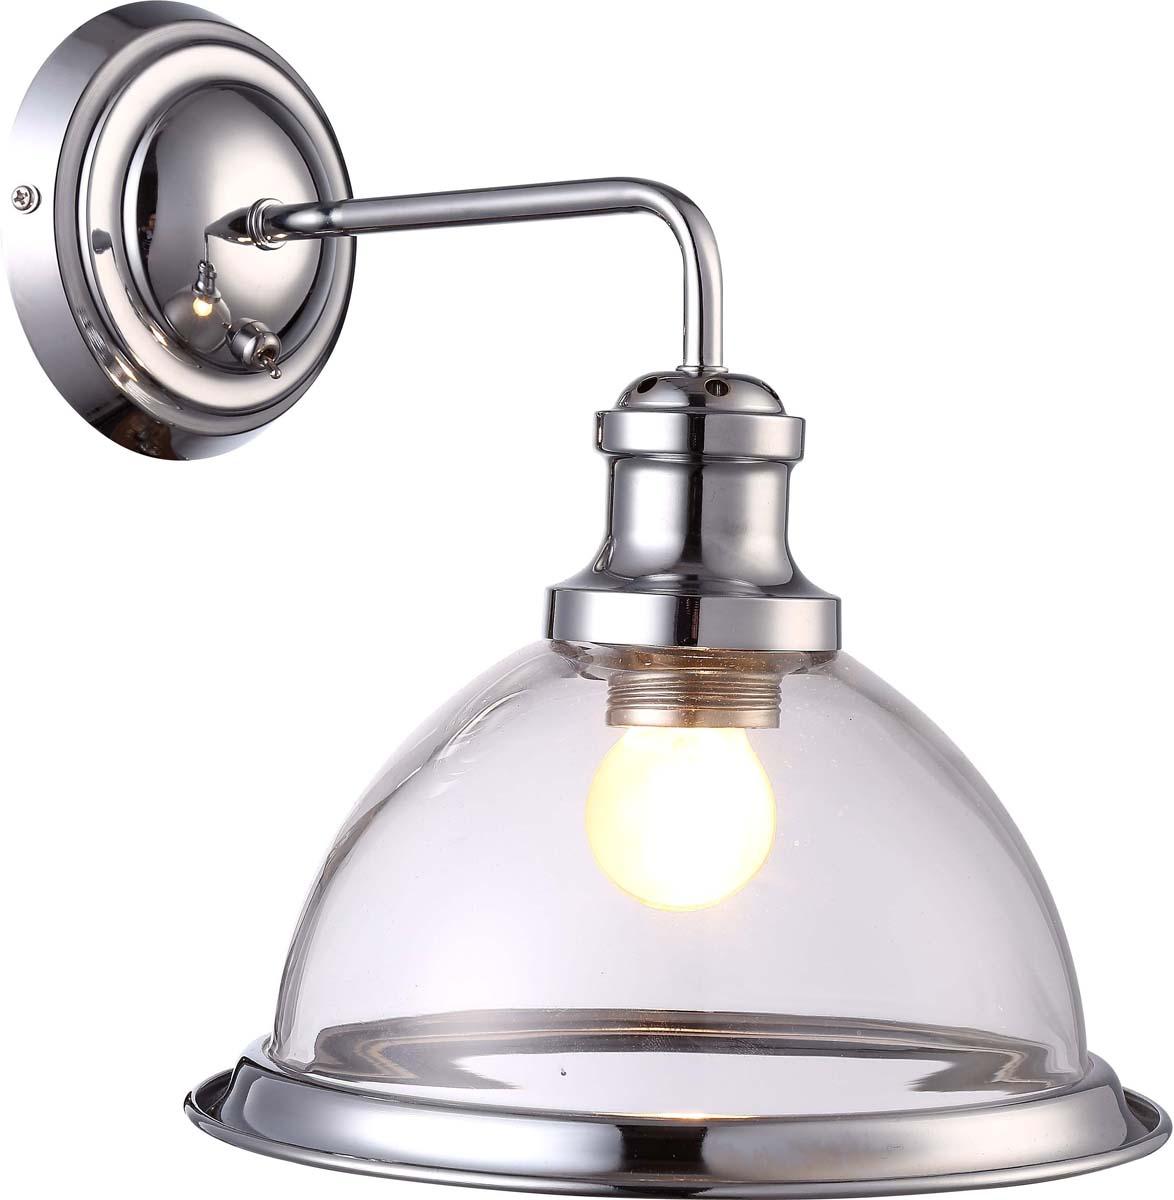 Бра Arte Lamp Oglio, цвет: серебристый, 1 х E27, 60 W. A9273AP-1CC бра arte lamp brooklyn a9517ap 1cc